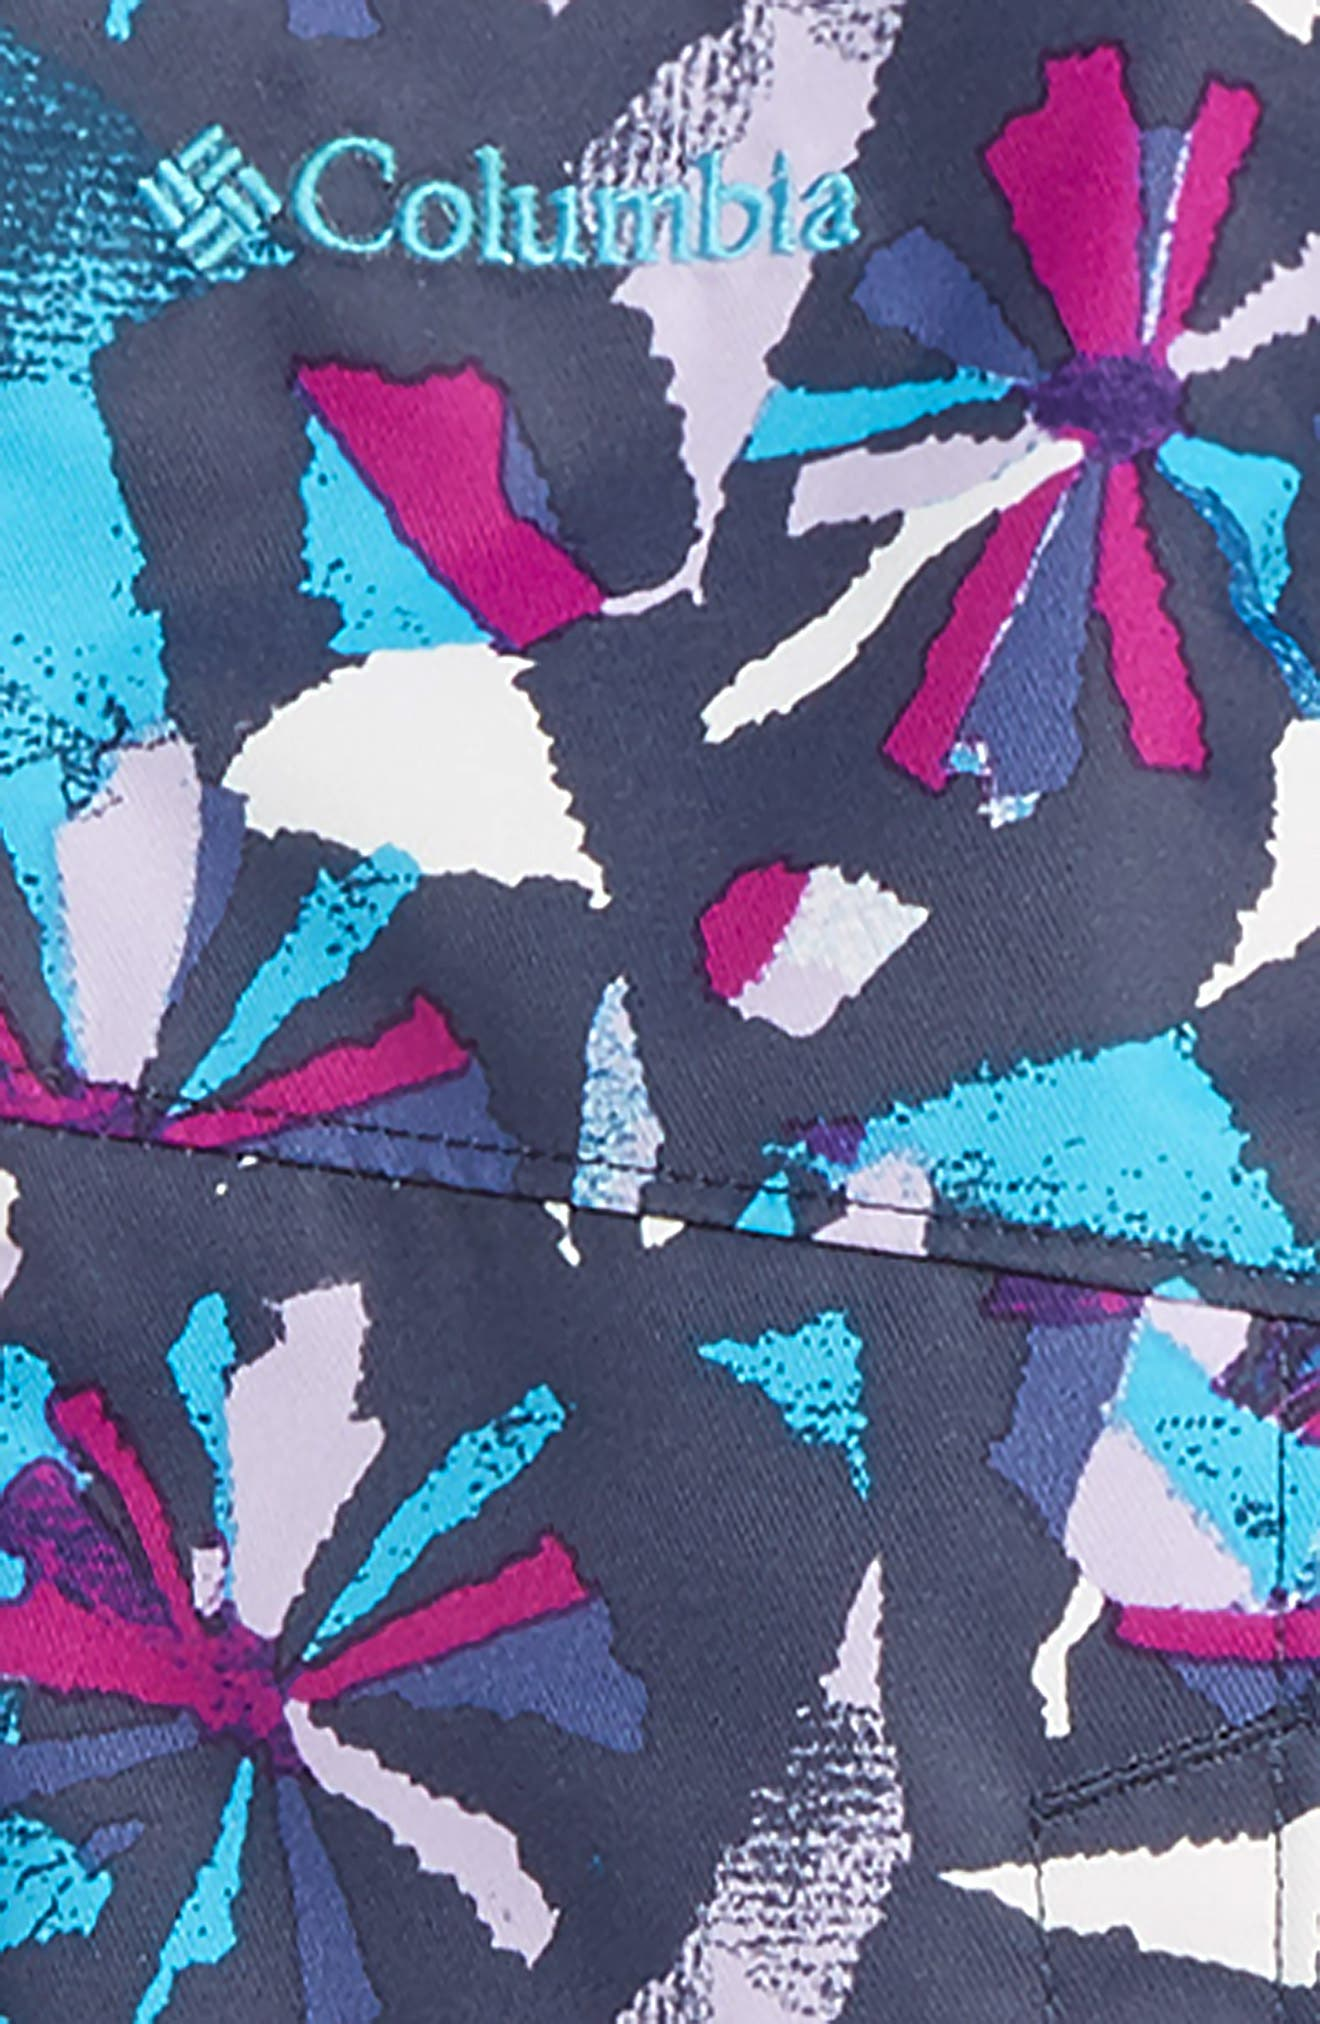 Buga Waterproof Insulated Jacket & Snow Bib,                             Alternate thumbnail 2, color,                             BRIGHT PLUM PINWHEEL